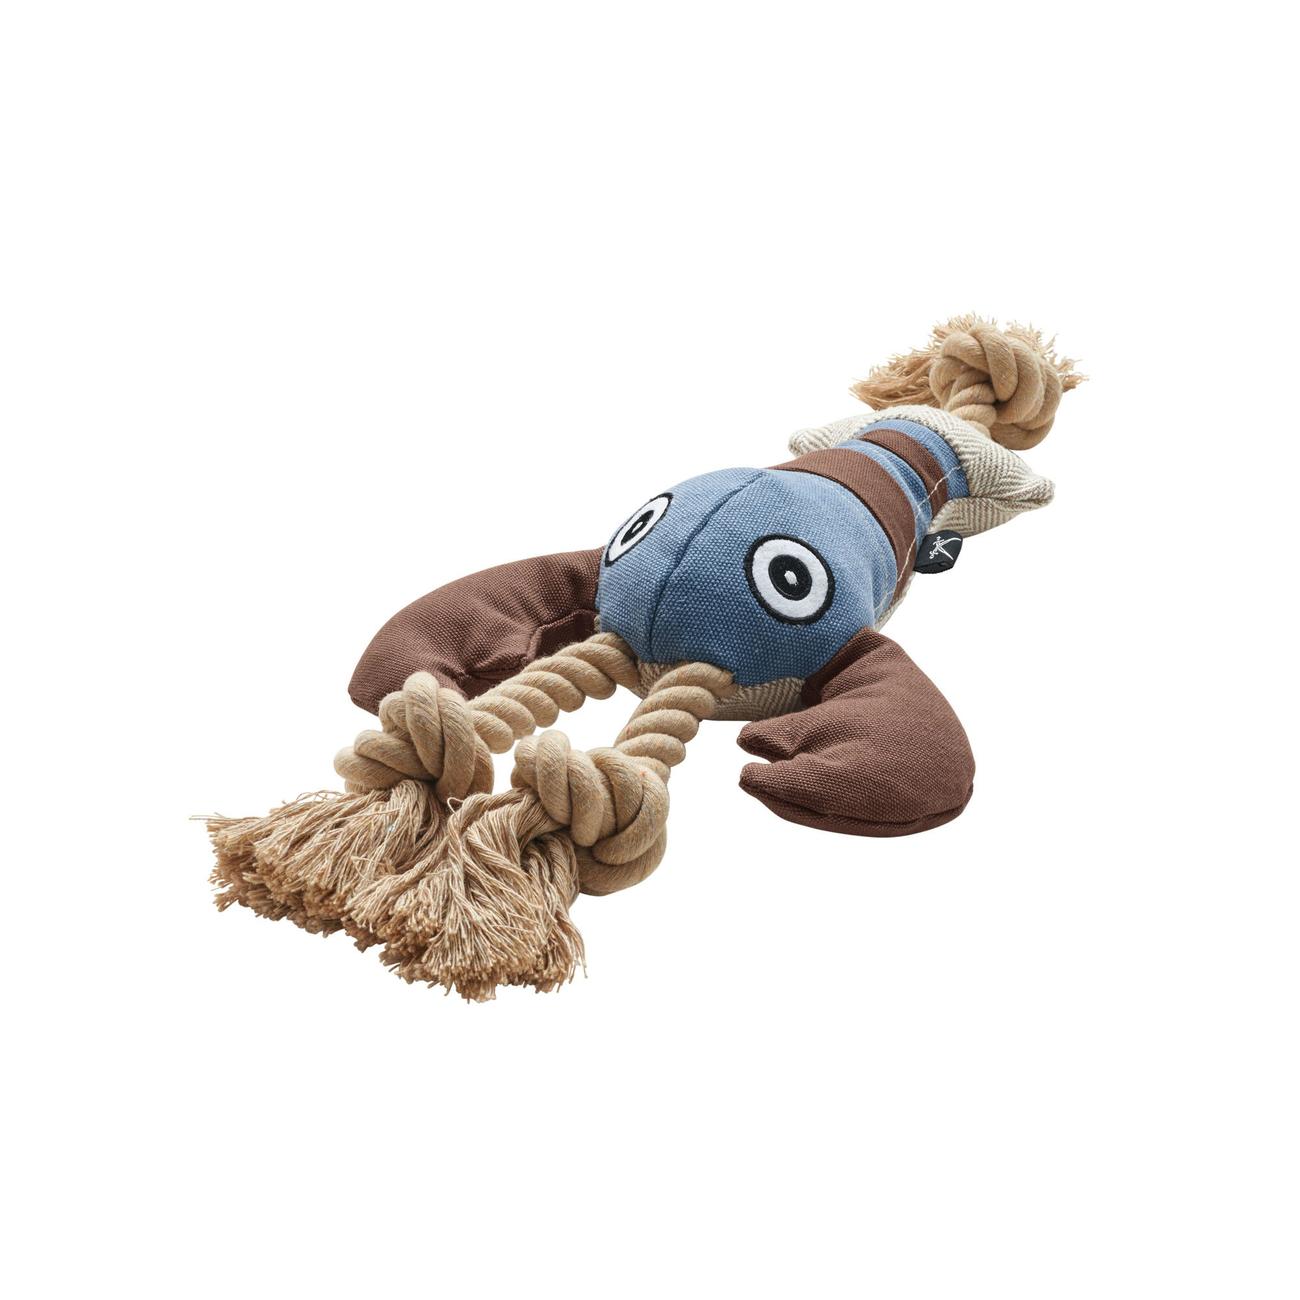 Hunter Hundespielzeug Canvas Sansibar Rantum 65660, Bild 2